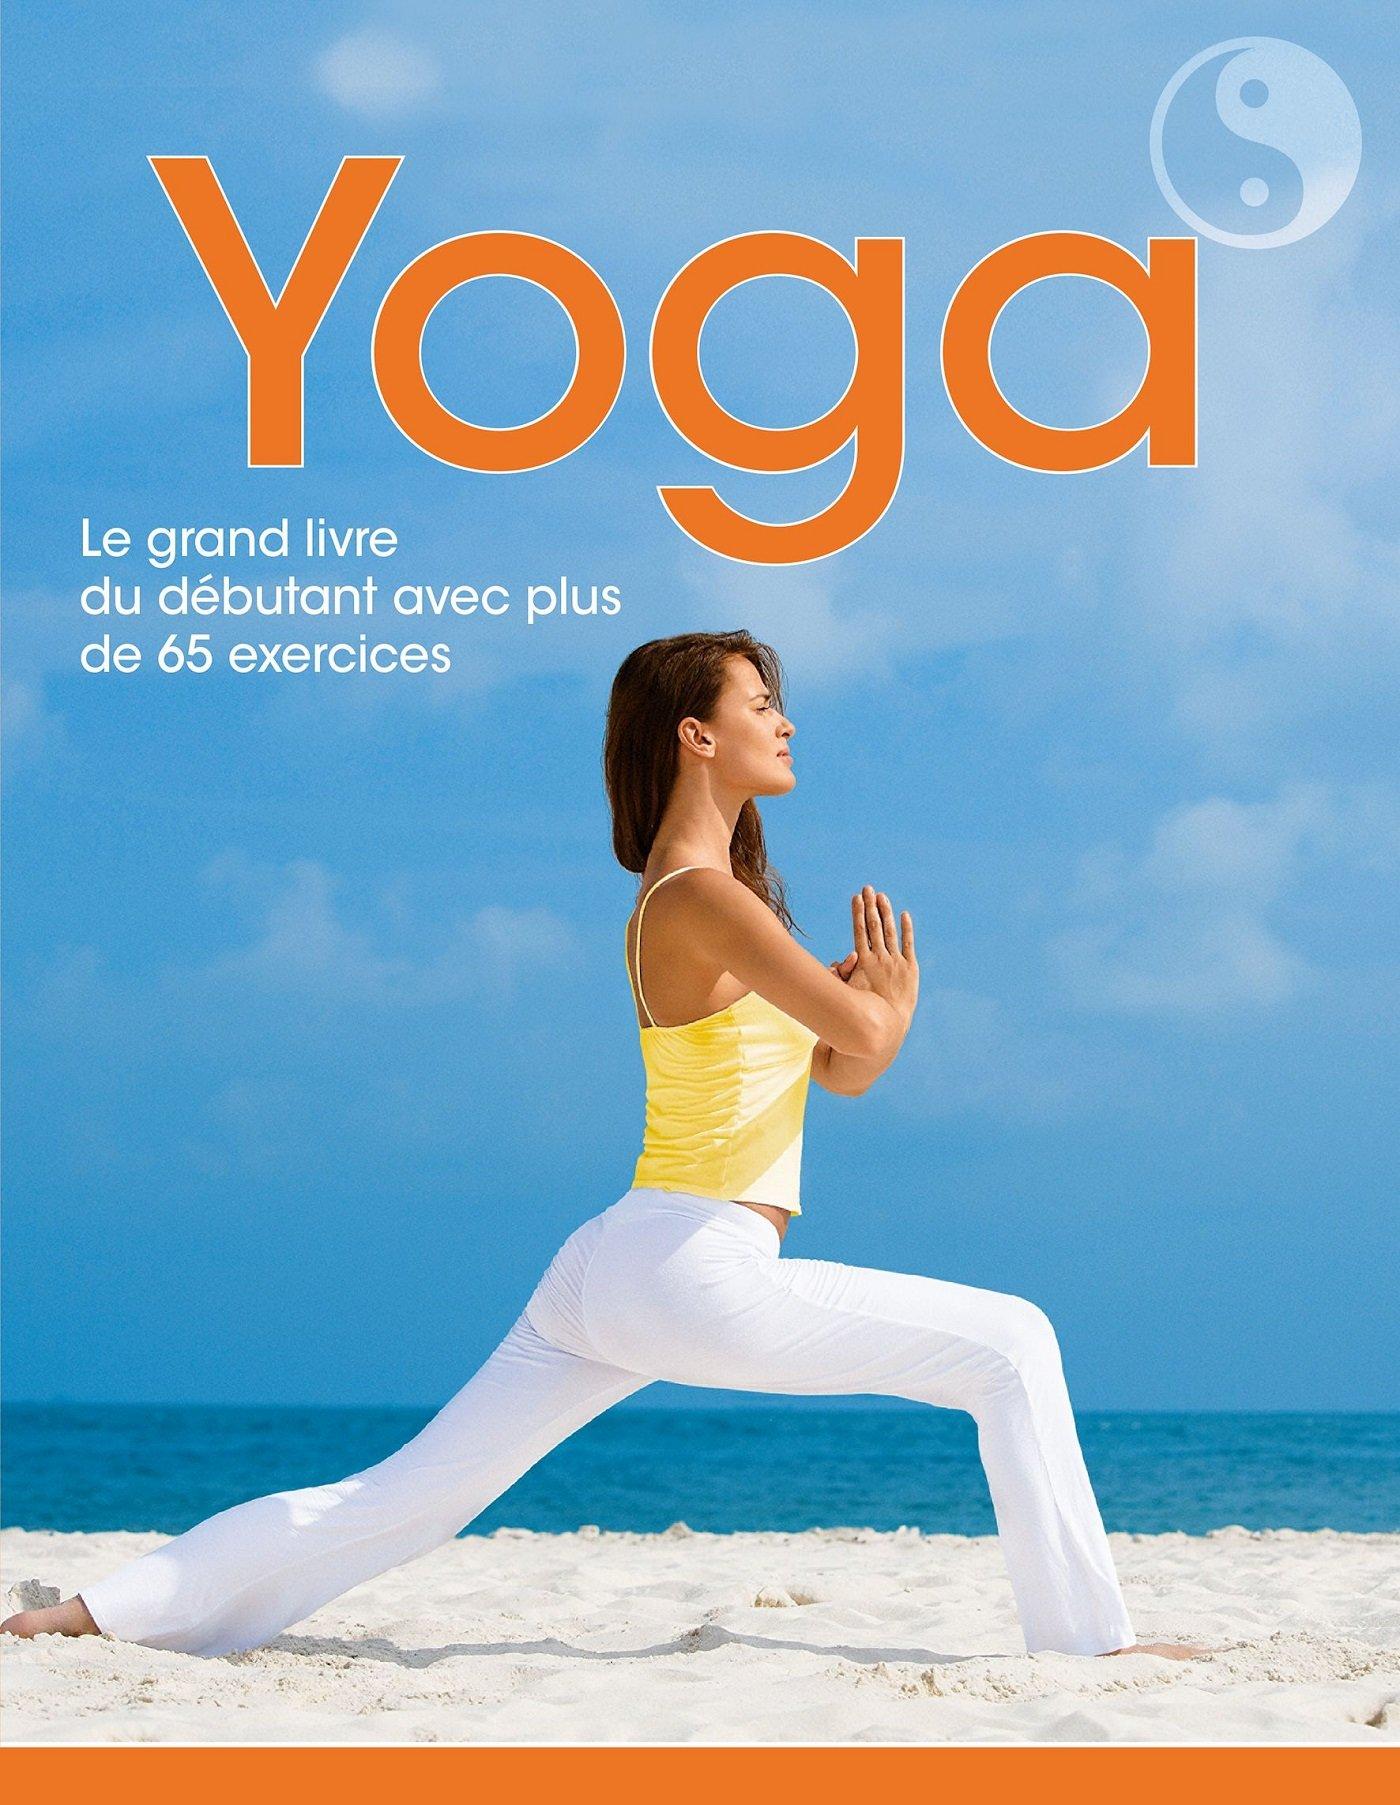 Amazon.fr - Yoga : Le grand livre du yoga avec plus de 65 postures -  Collectif, Barbara Klein, Ulrike Lowis, Claudia Pfeiffer, Robert Polster -  Livres